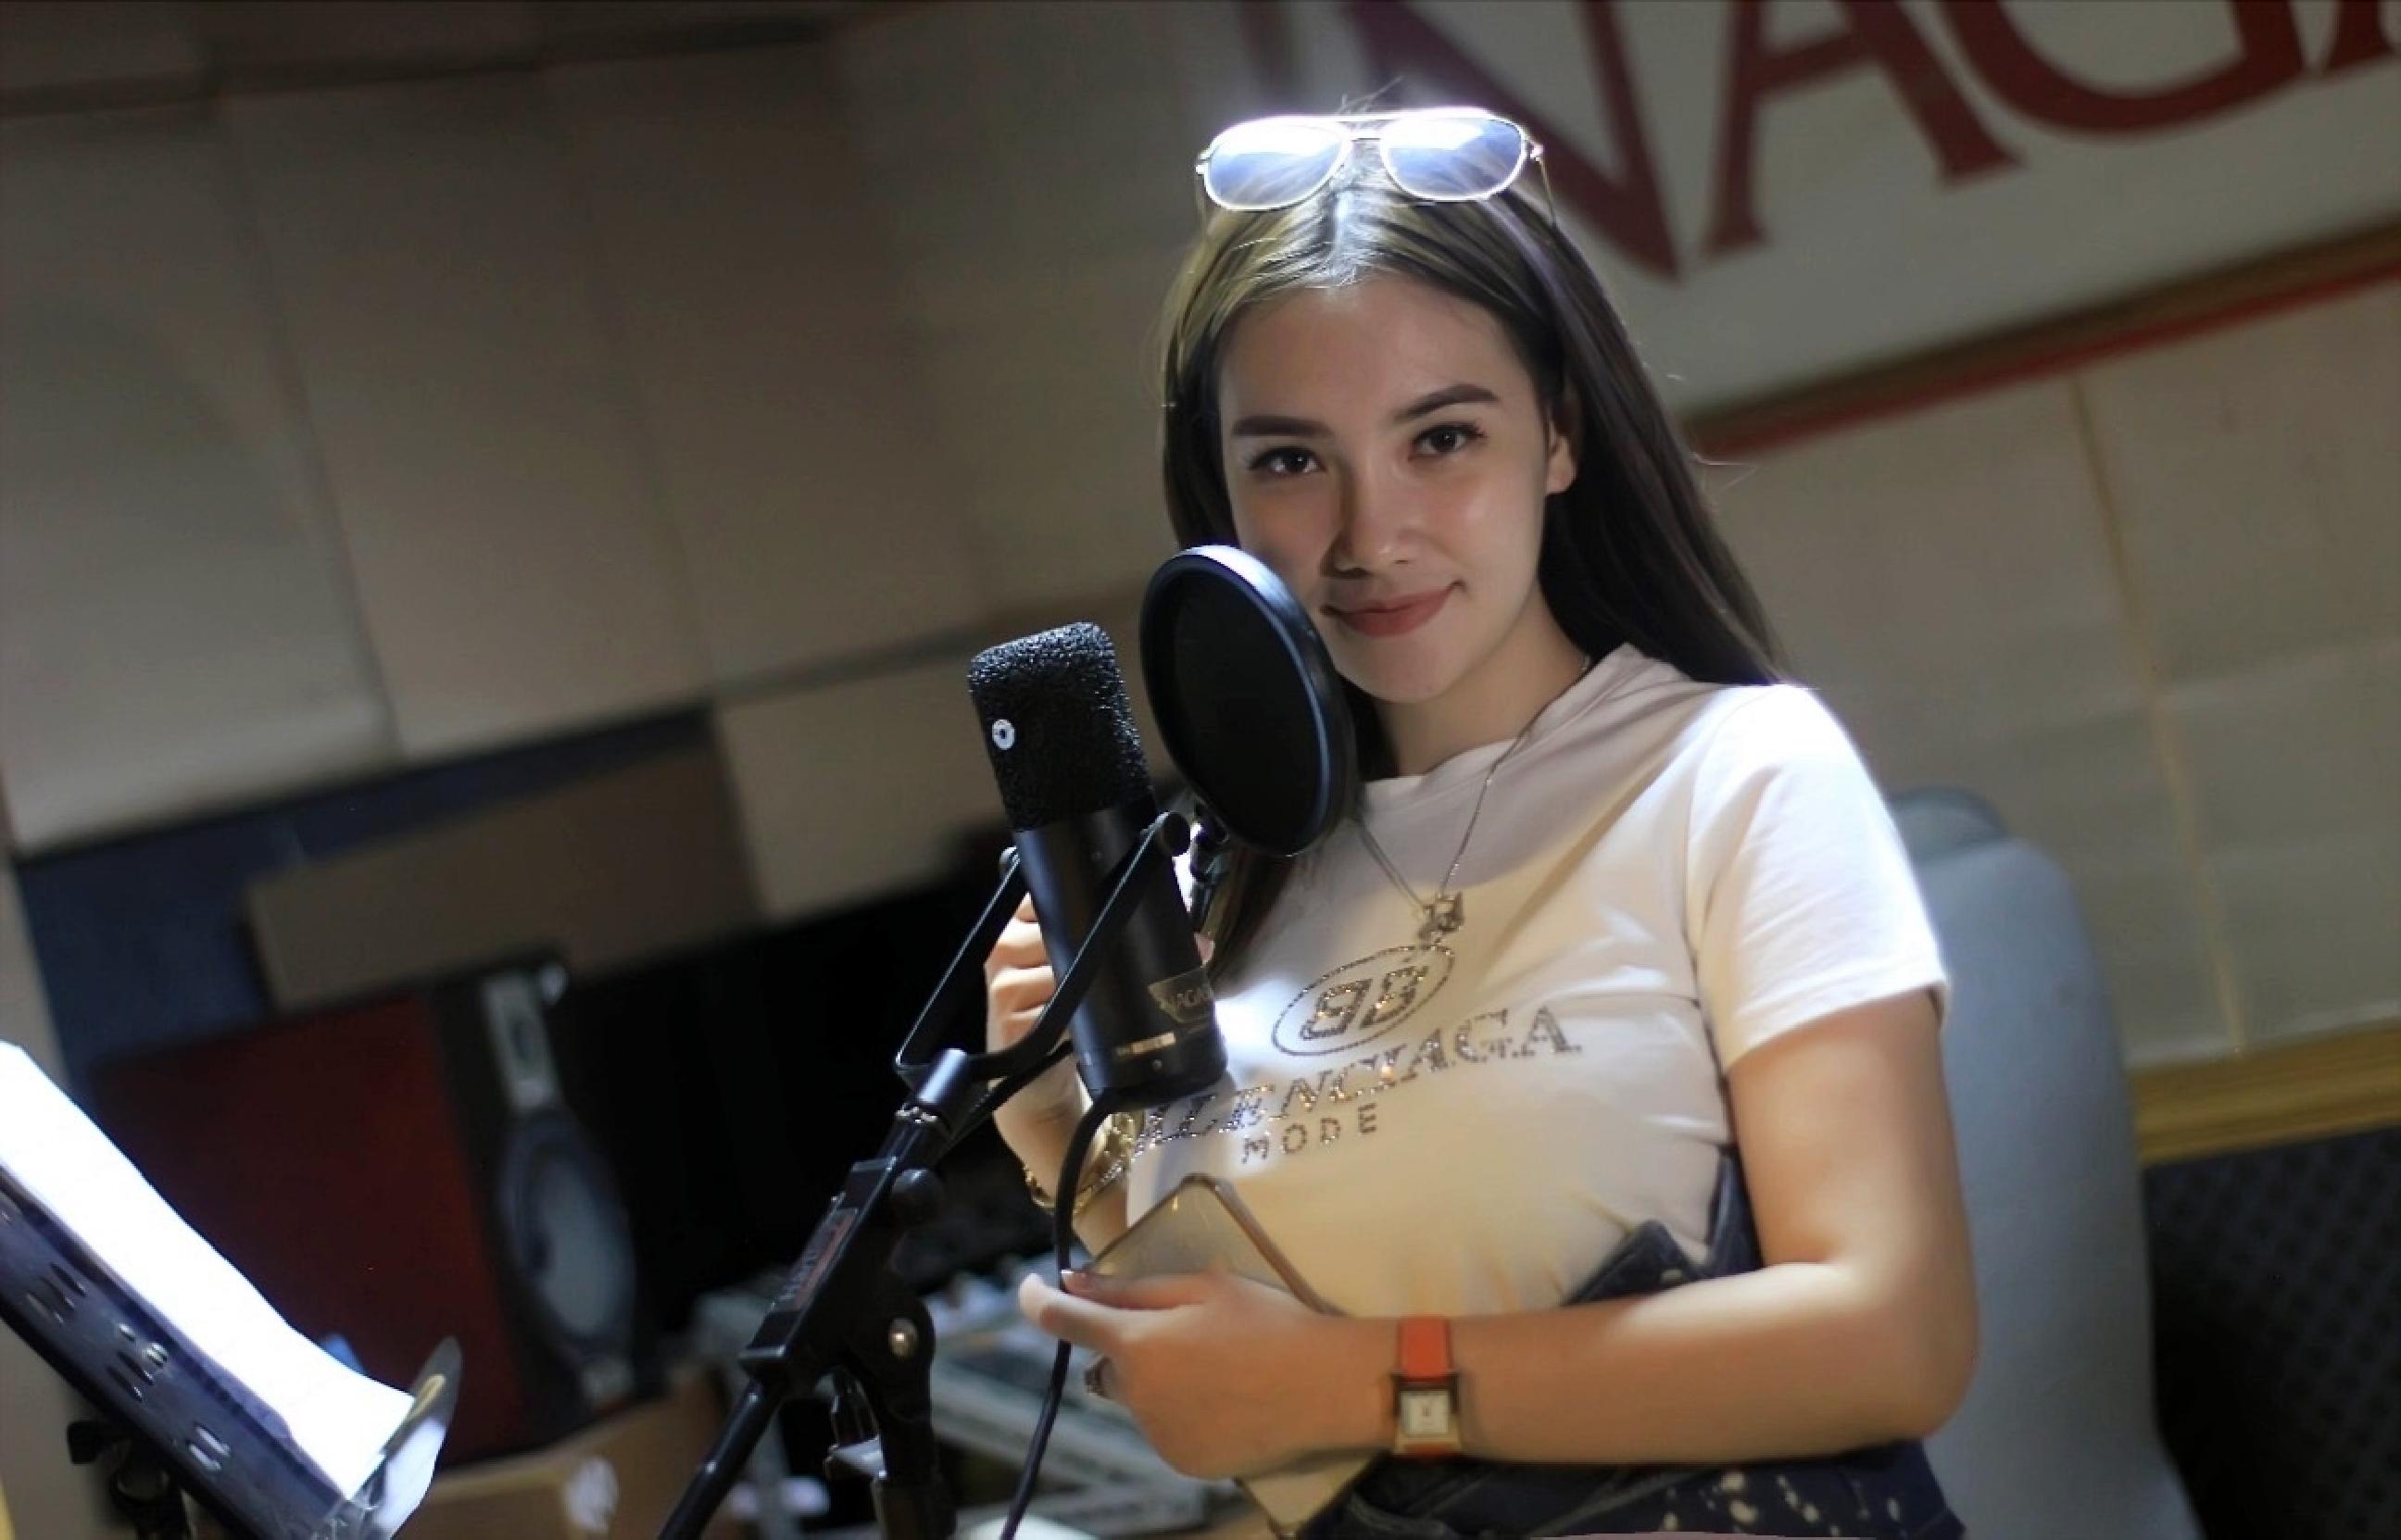 Ditengah sibuk pemotretan, Puteri Juby siapkan single pop terbaru